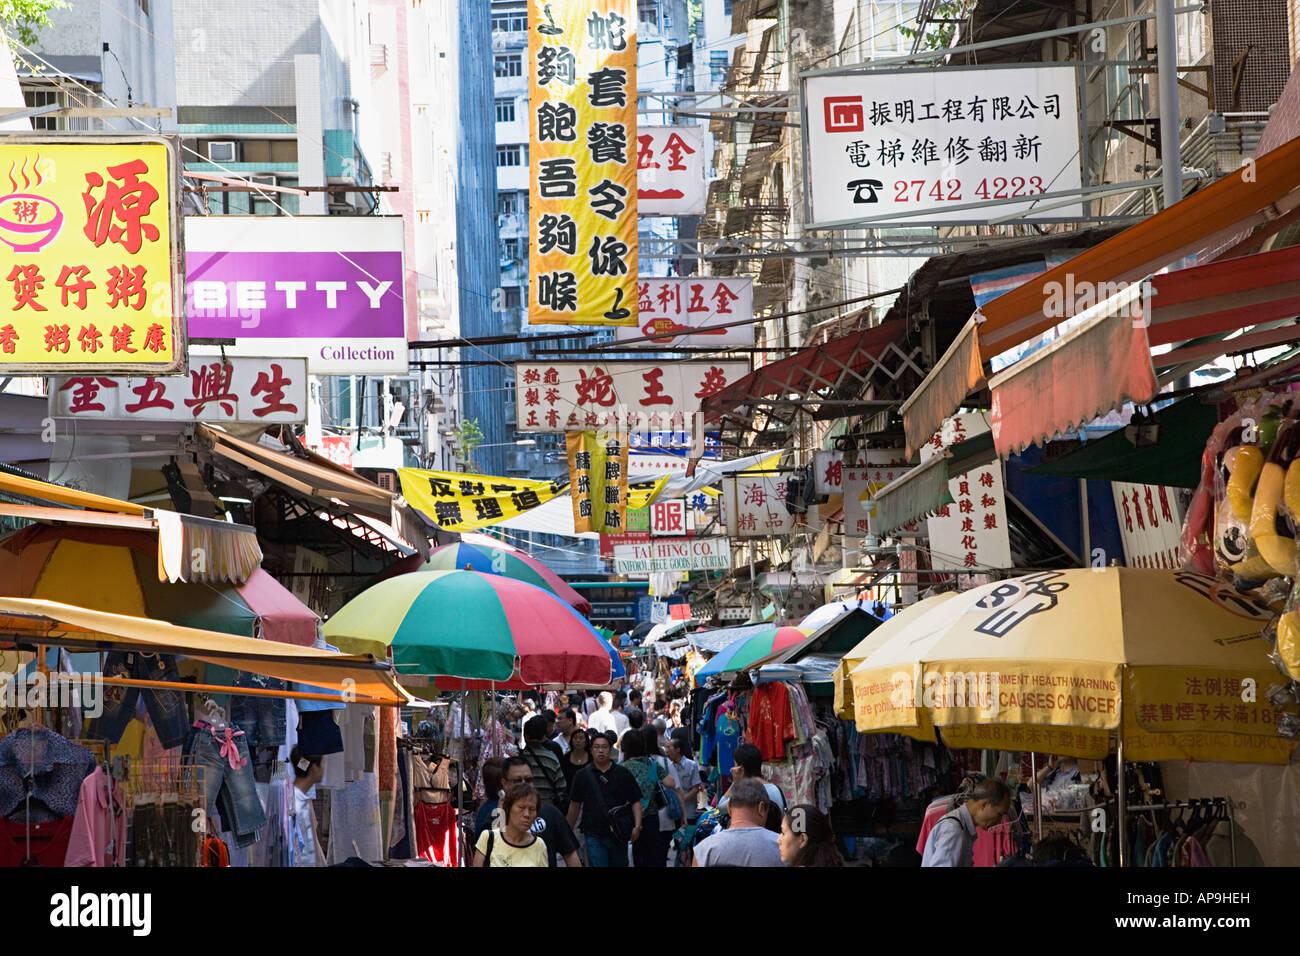 Chinesischer Straßenmarkt Stockbild